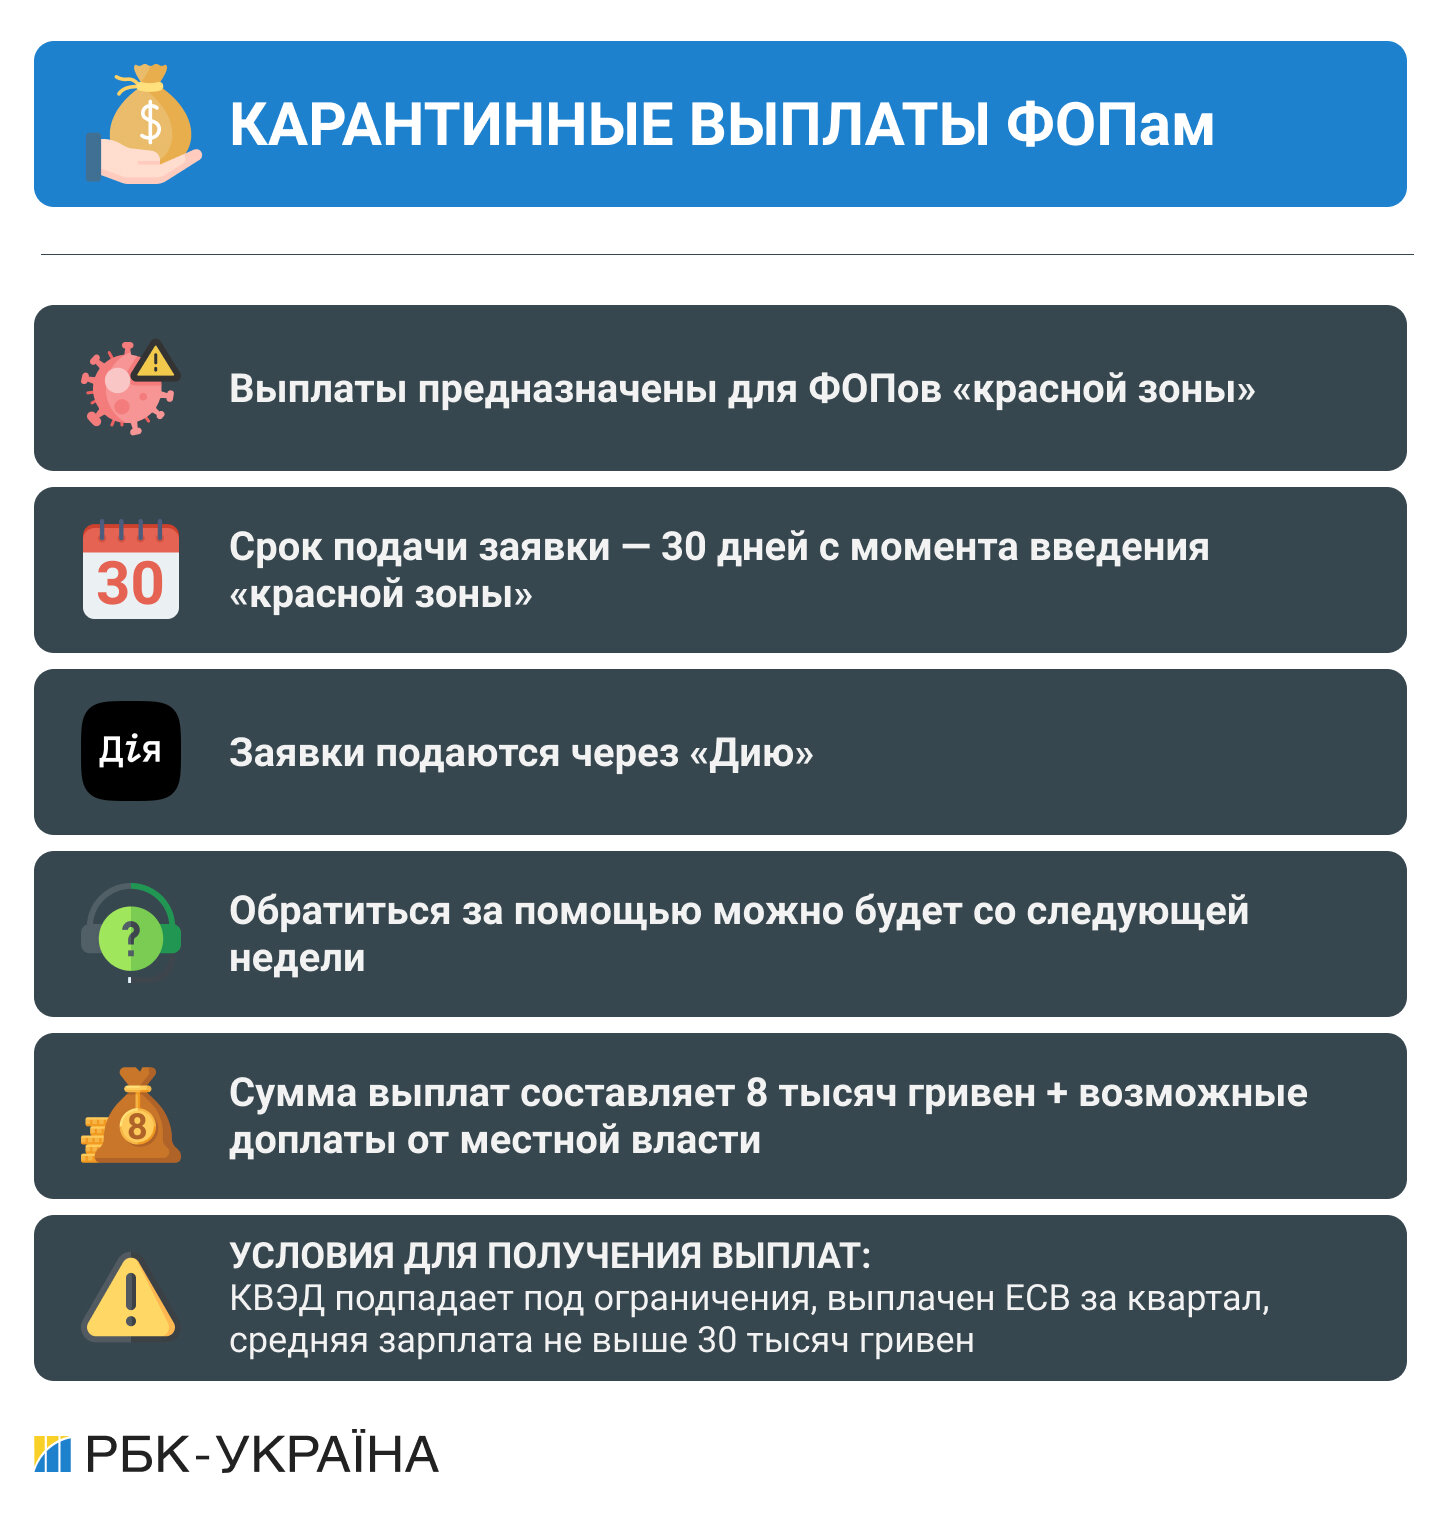 rbc_info_fop_red_zone.jpg